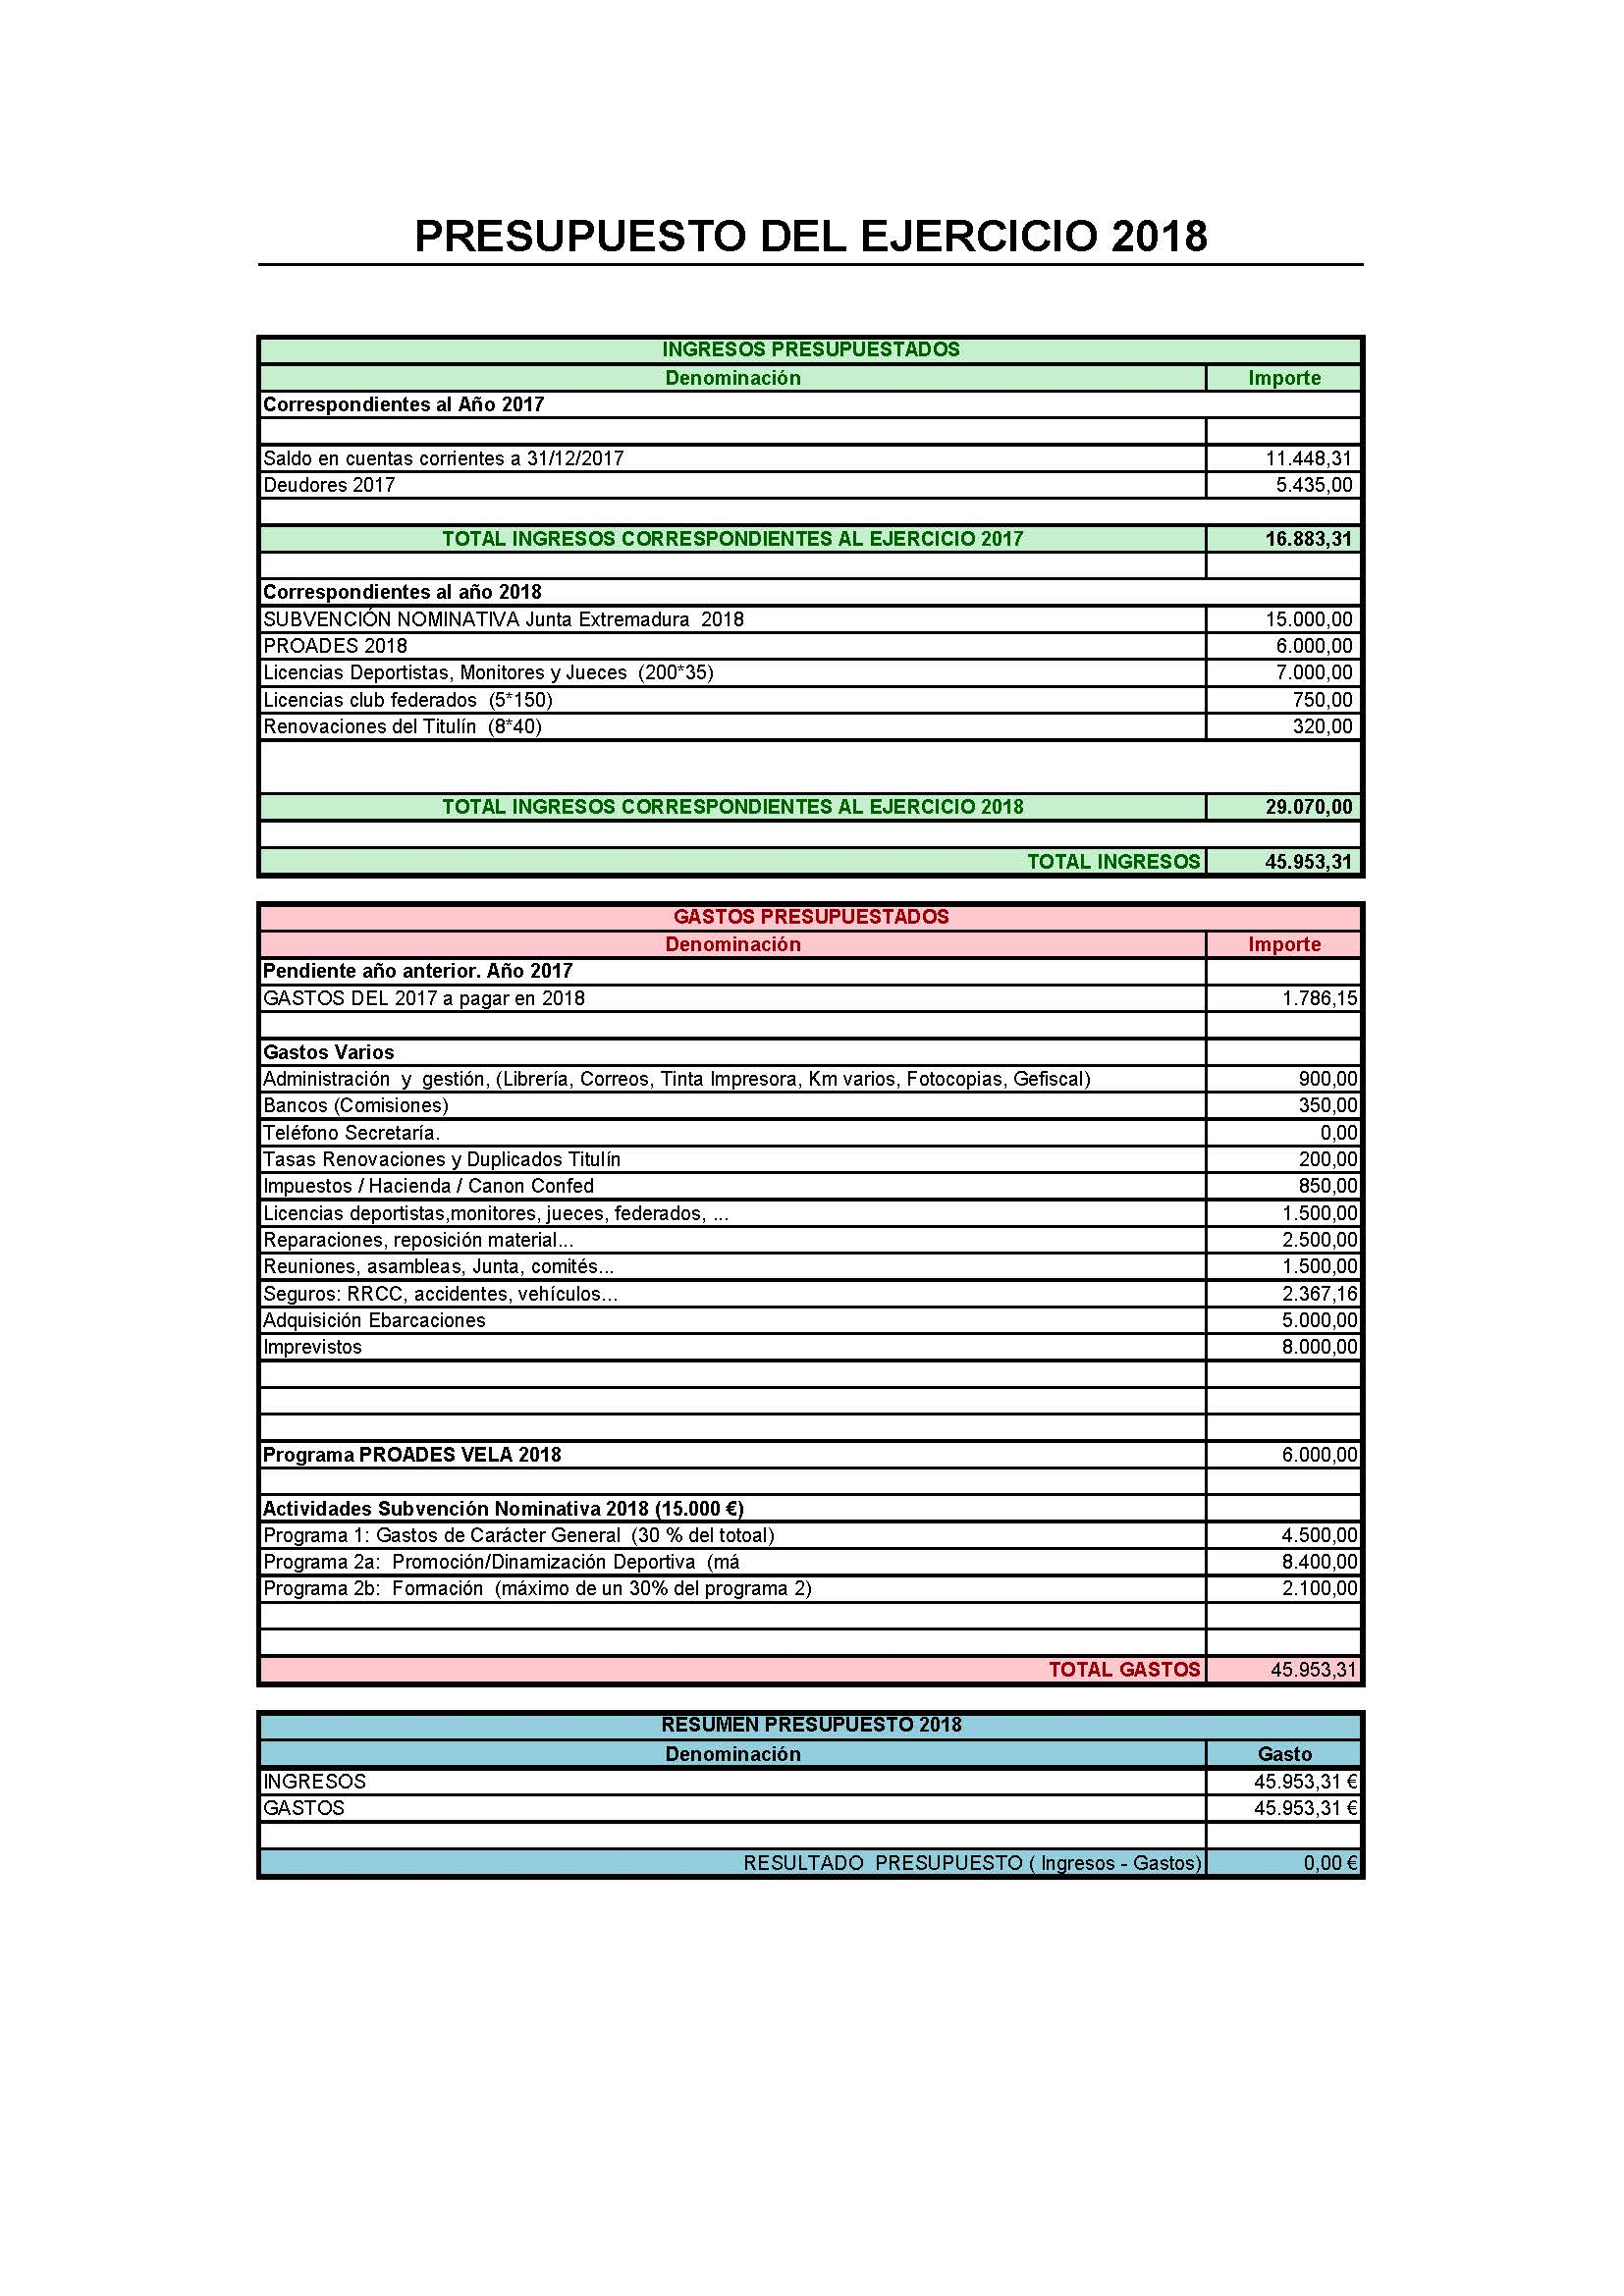 Presupuesto FEXVELA 2018